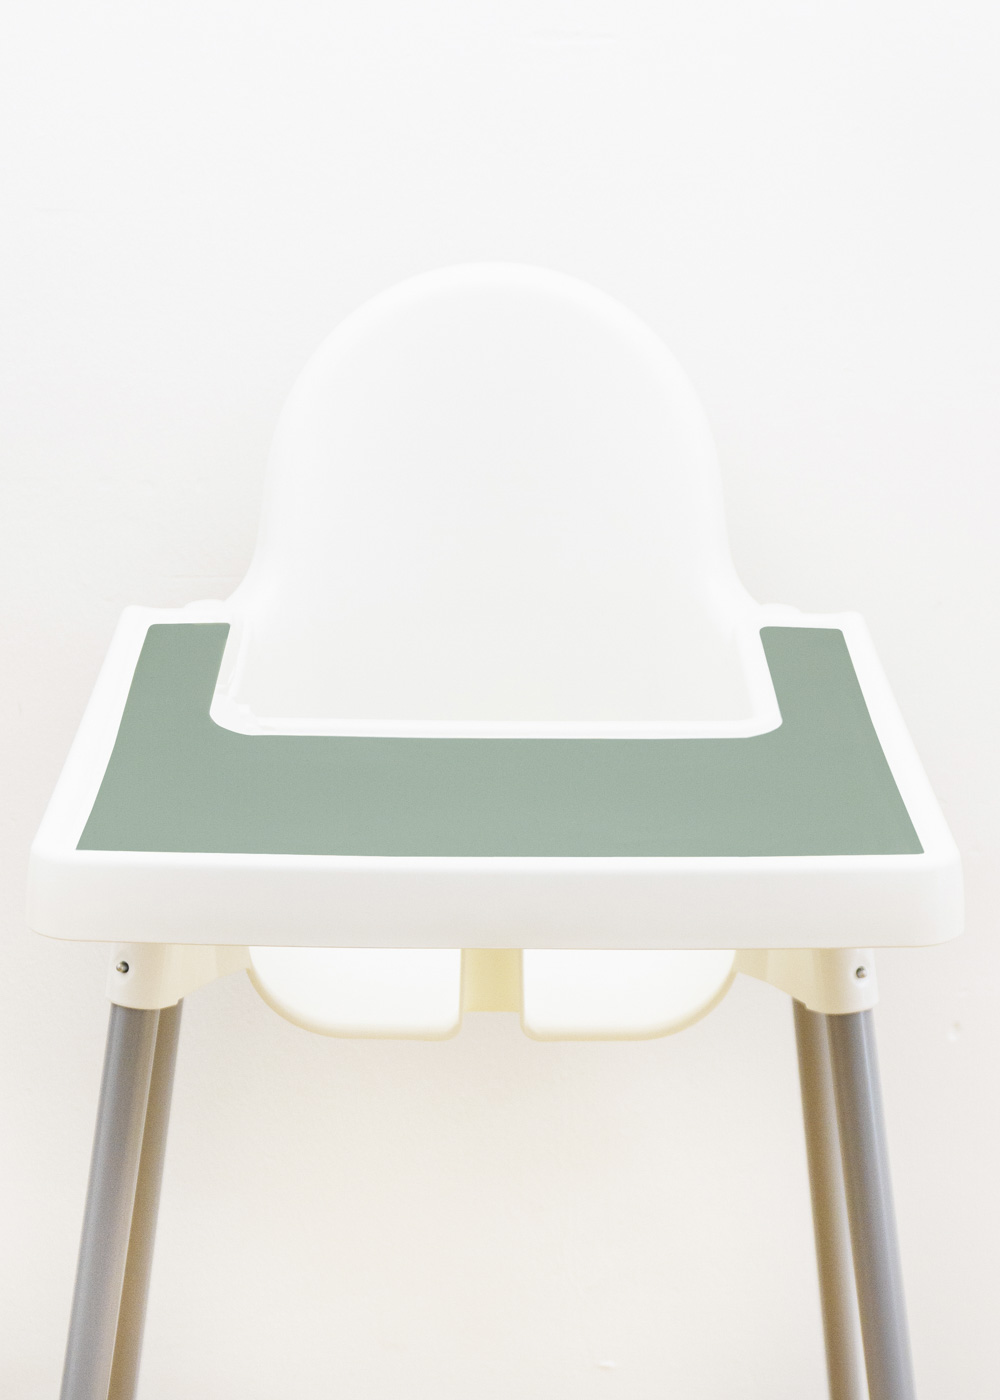 Silikonmatte Ikea Antilop Hochstuhl Klecka Mat eukalyptus